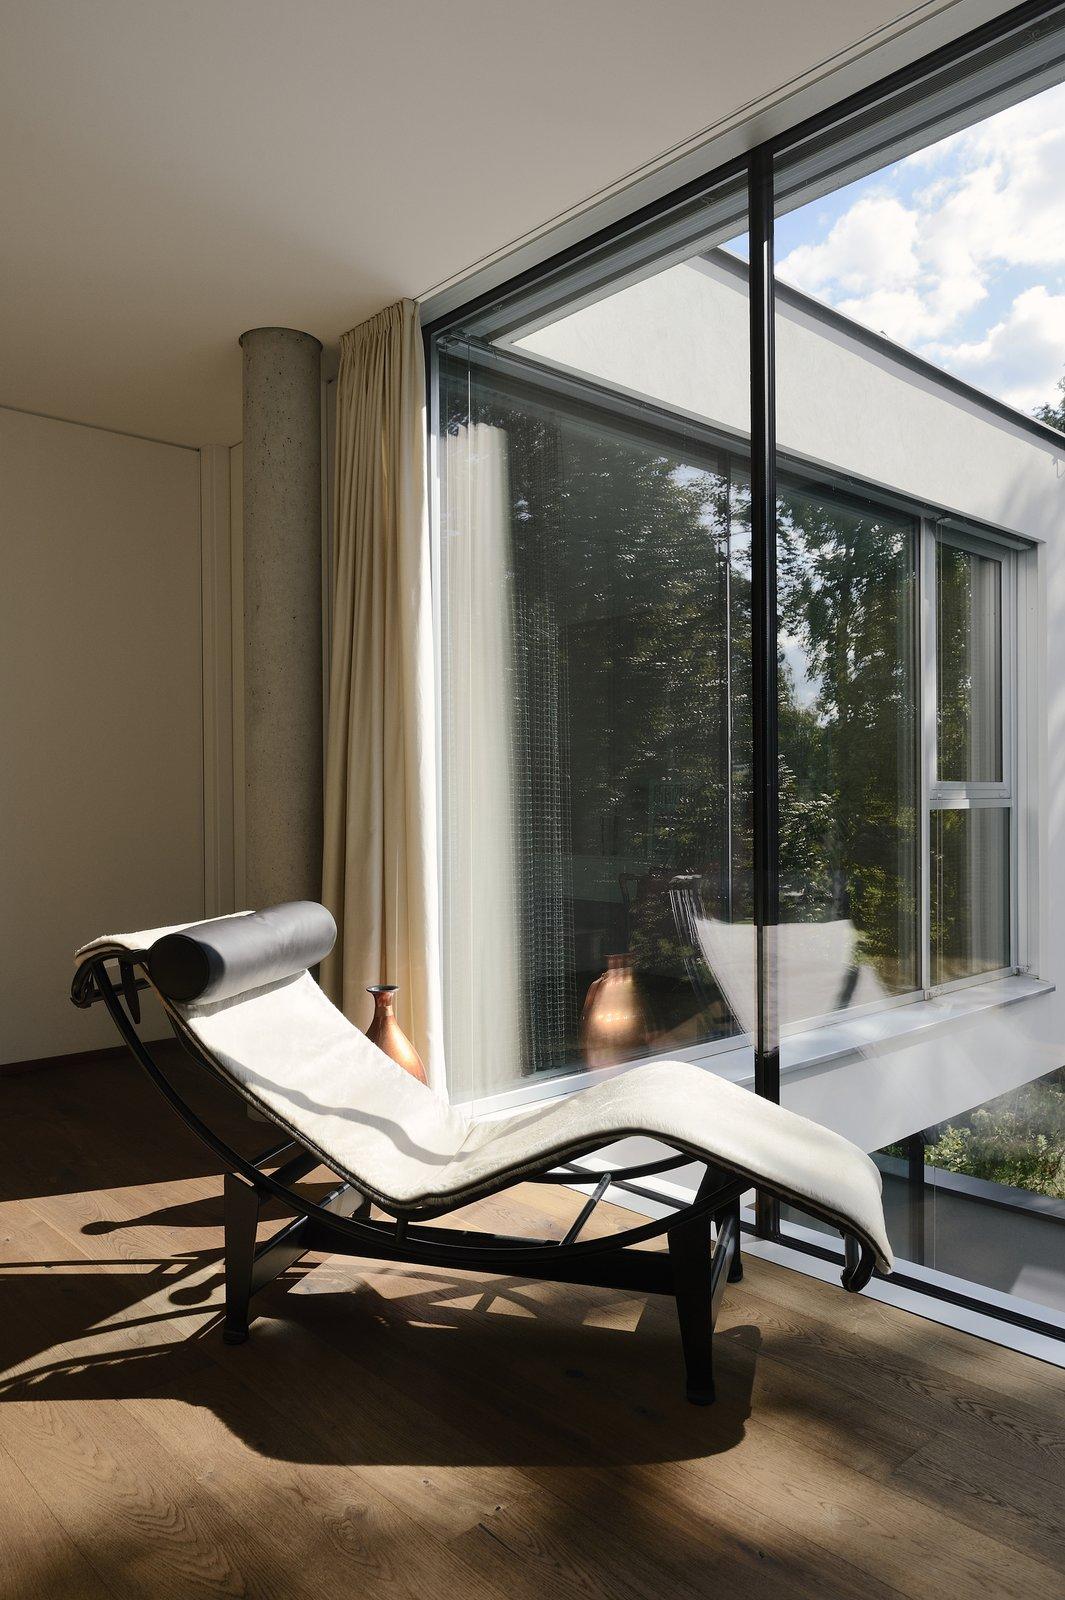 LC chair H_O by Architect Zoran Bodrozic